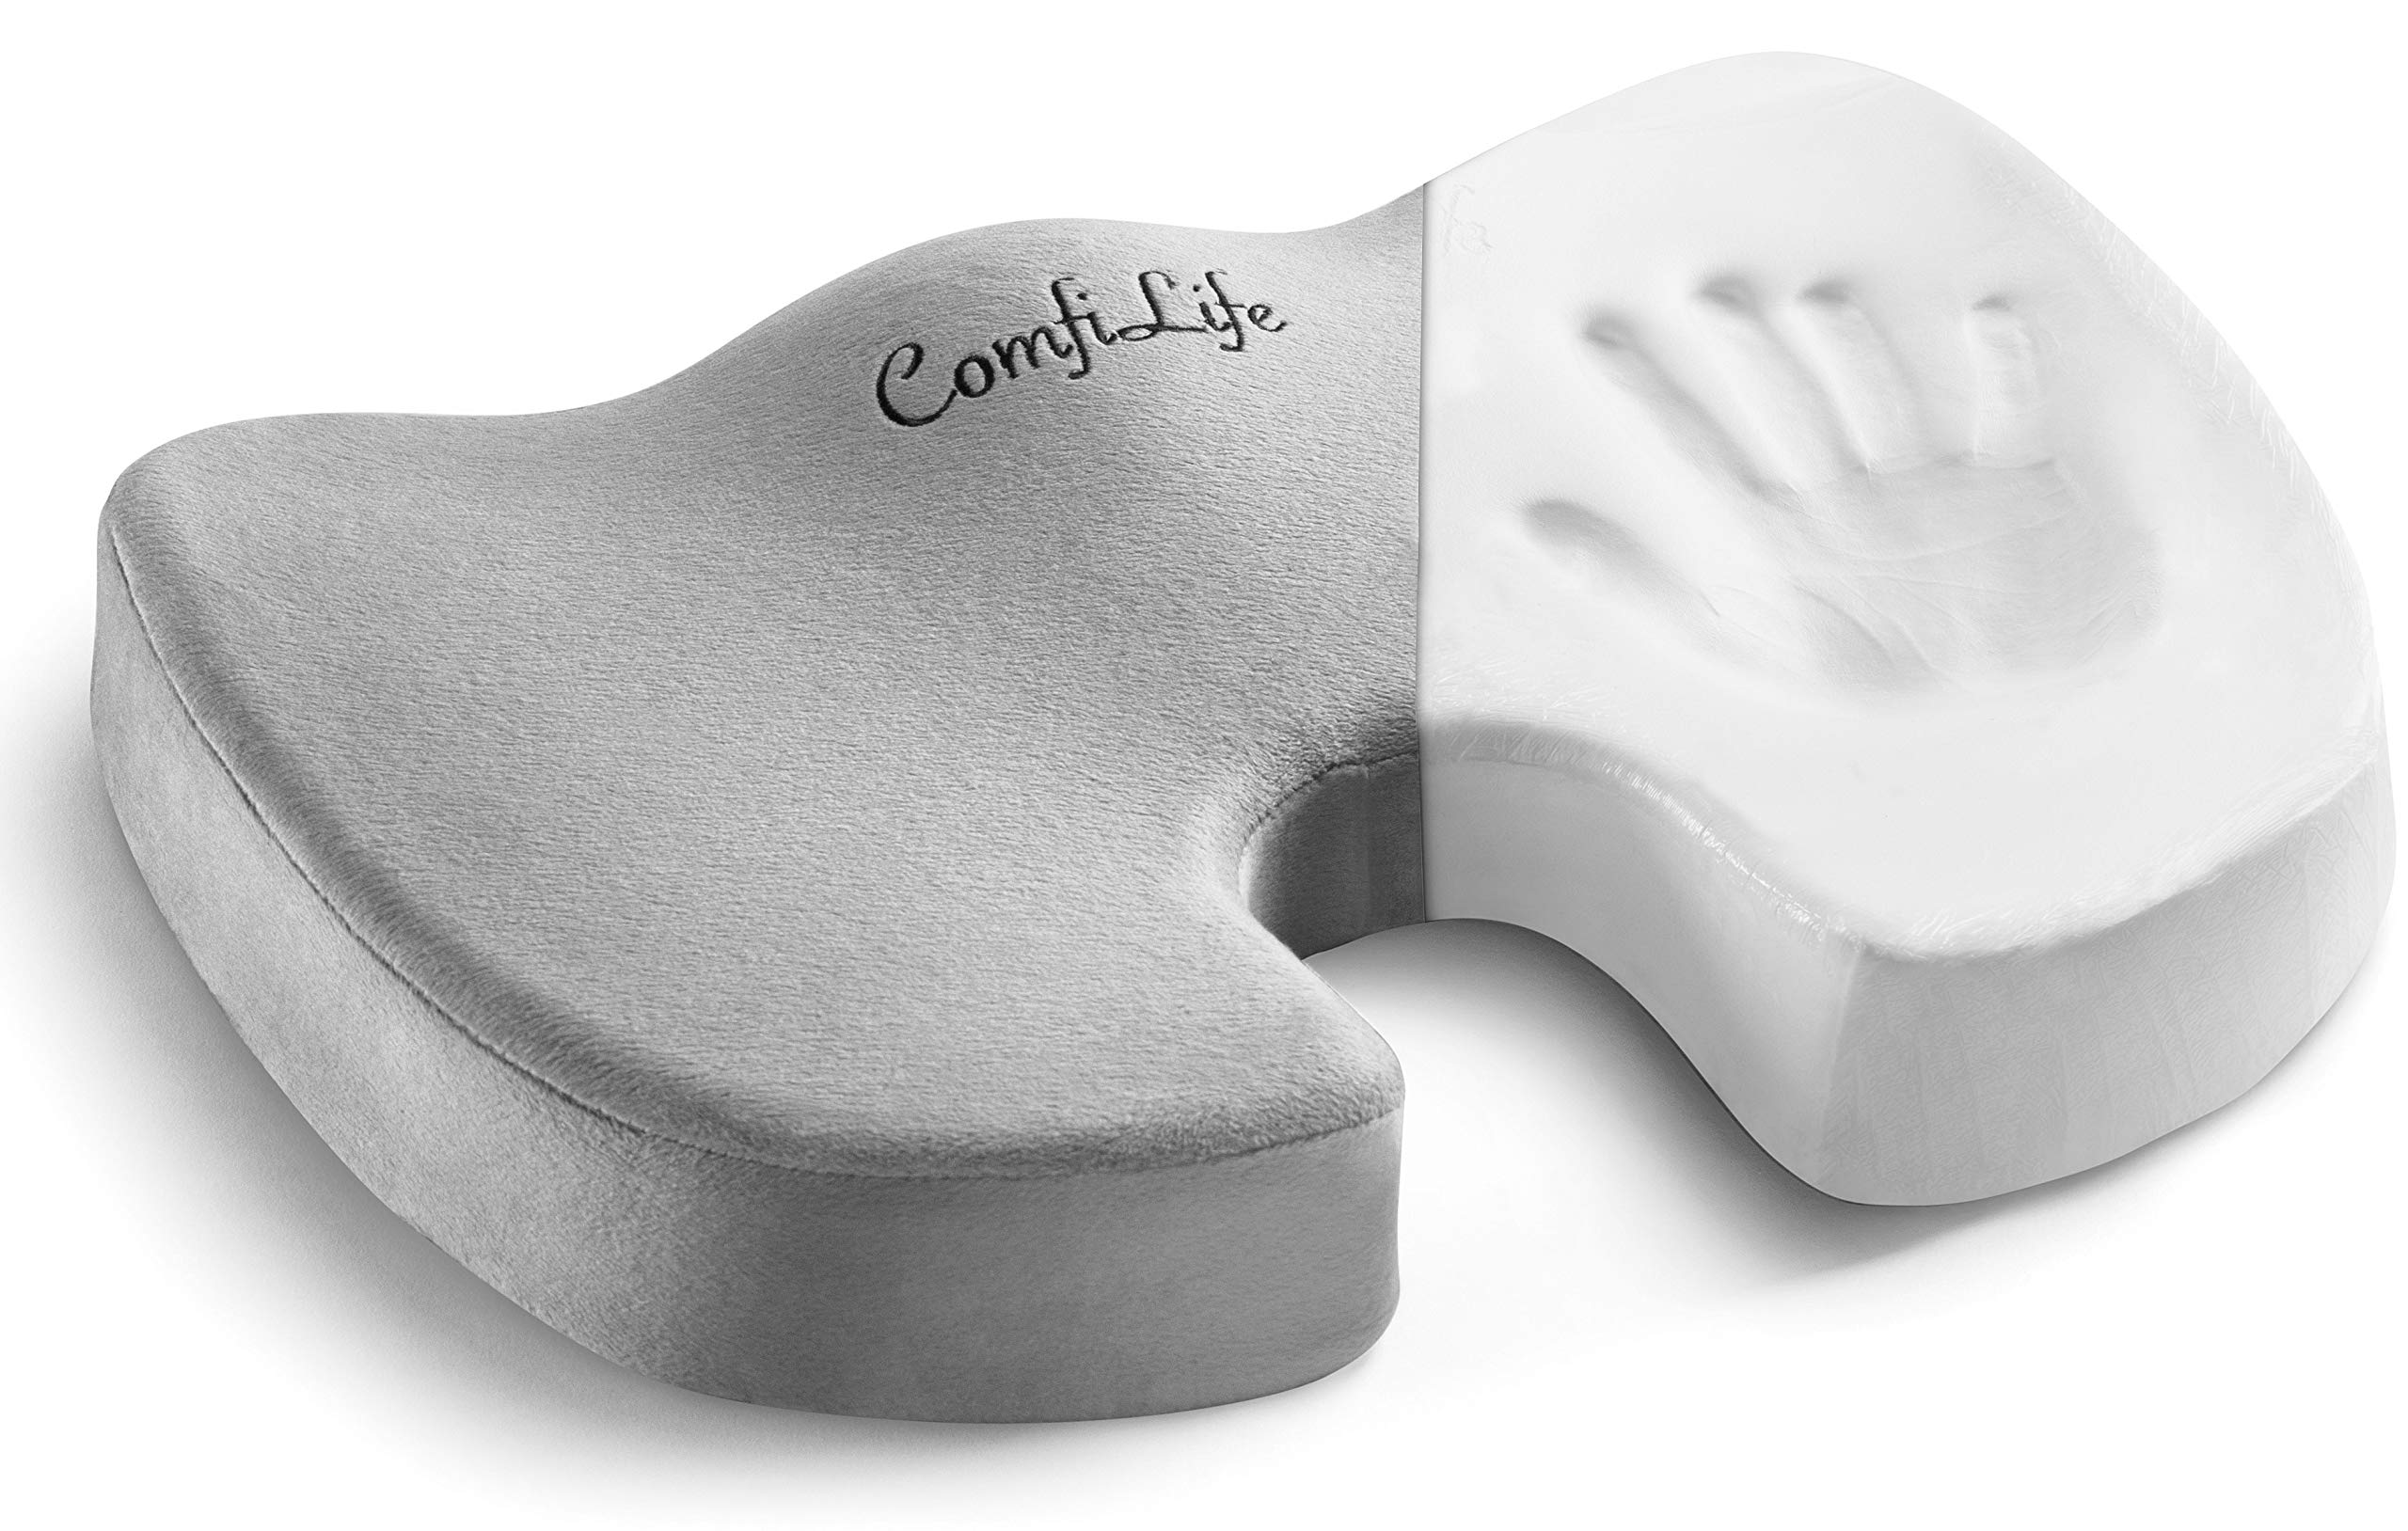 ComfiLife Orthopedic 100% Memory Foam Coccyx Seat Cushion